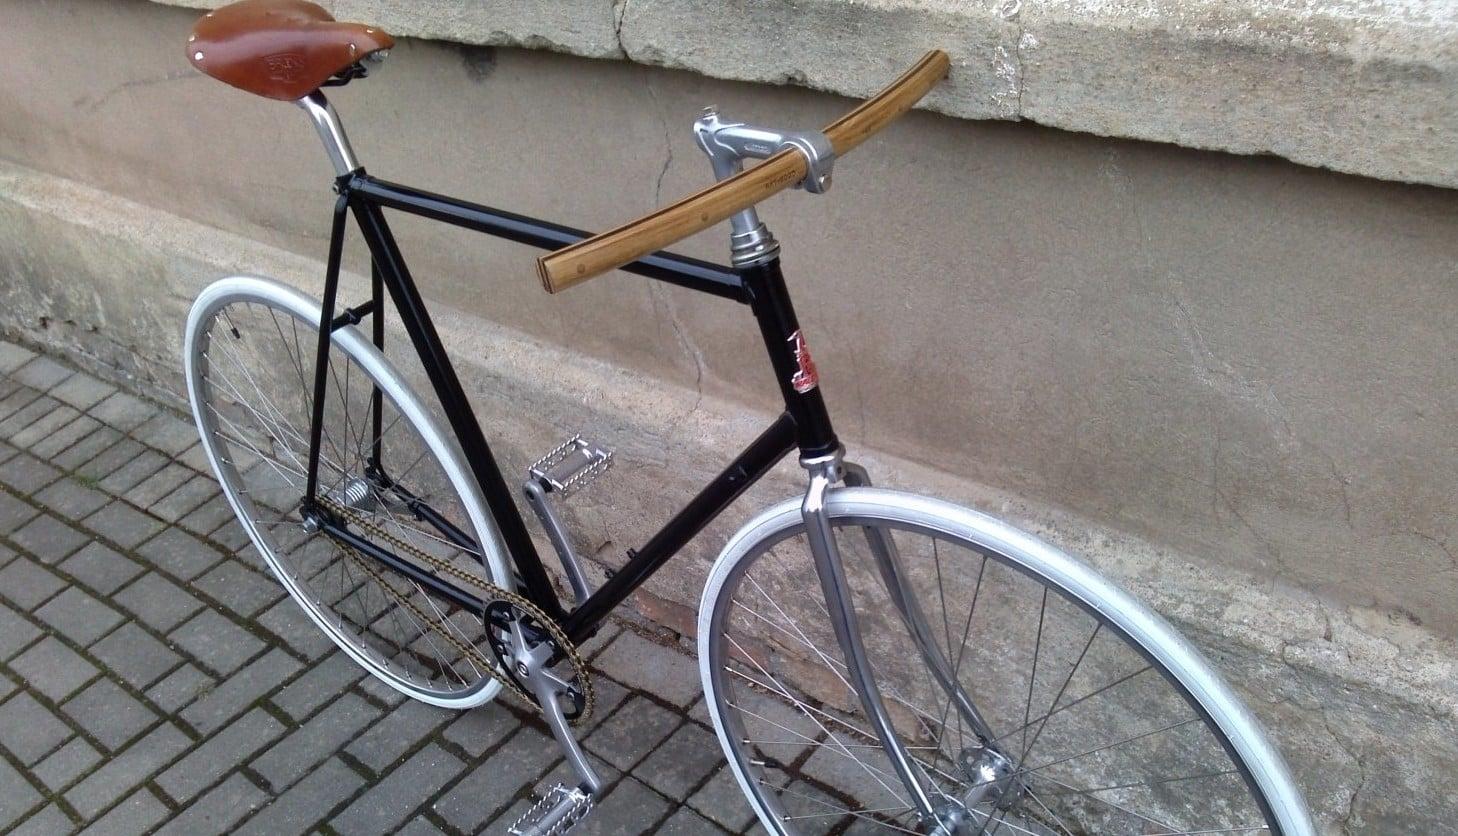 Fahrradlenker »Wilhelm« Holz an einem Fixie Bike | Art-WooD